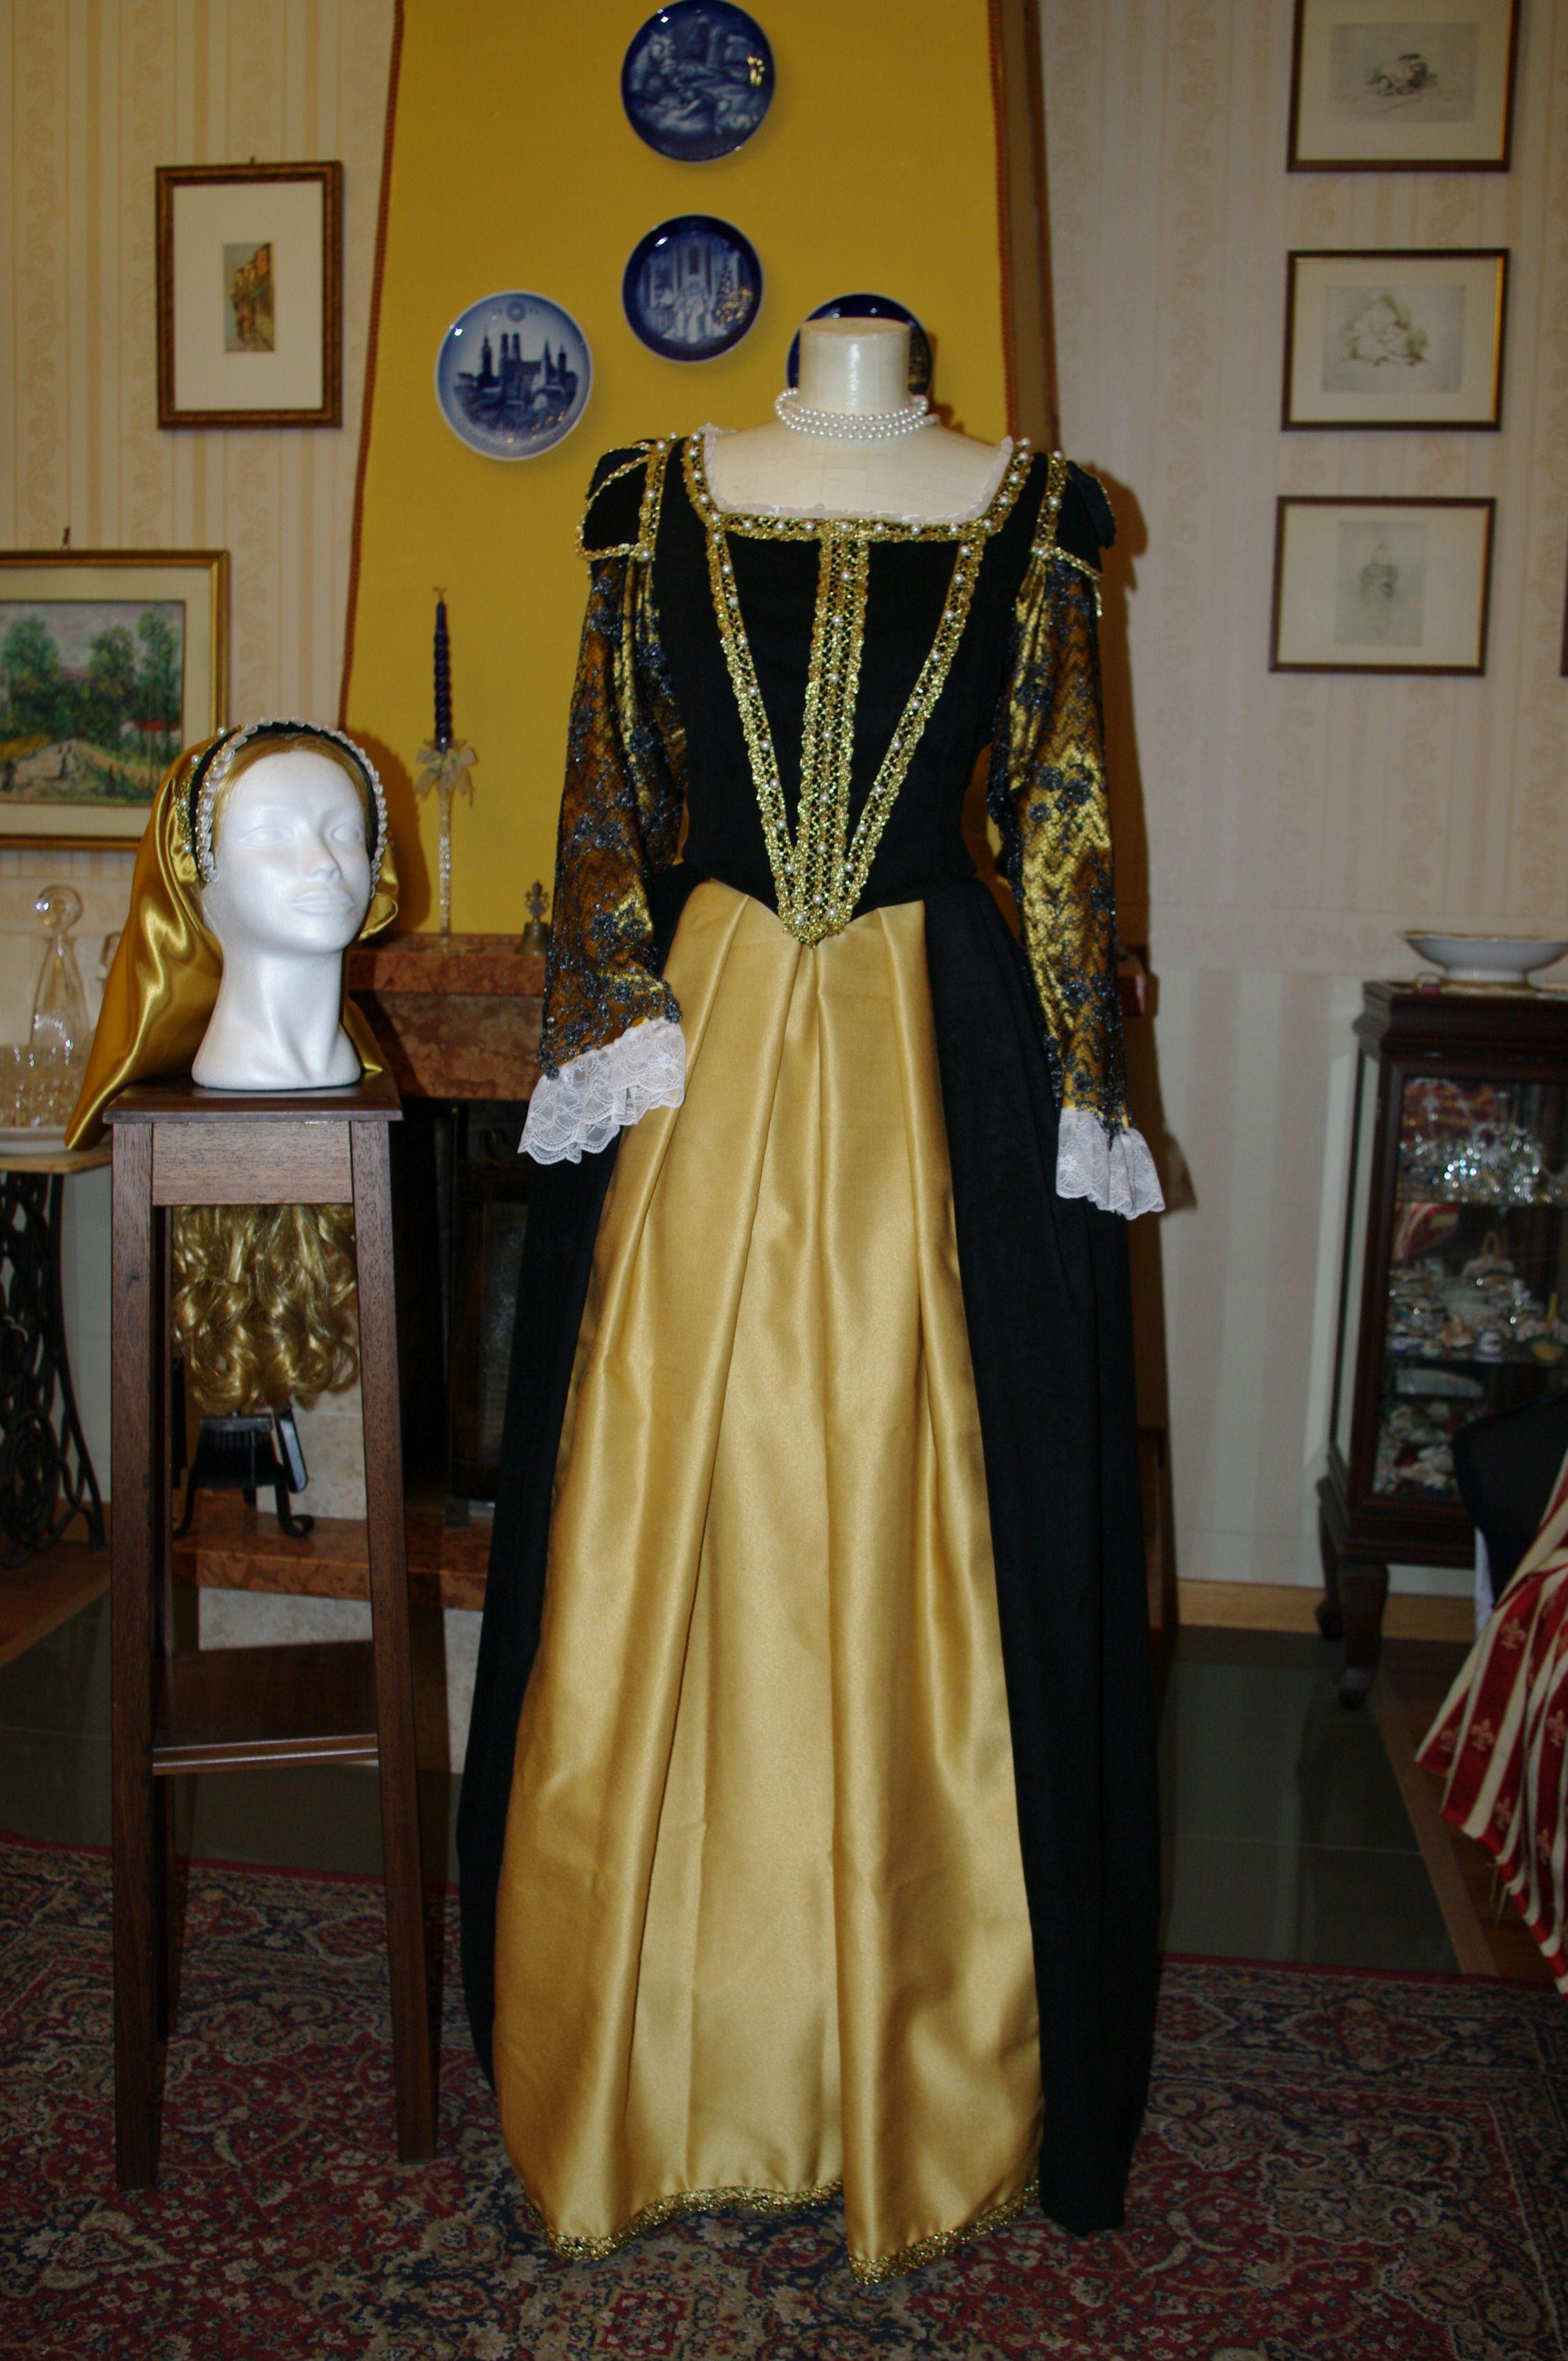 ee9a4774a944 ABITI STORICI FEMMINILI 1500 INGLESE Abito costume storico femminile 1500  inglese